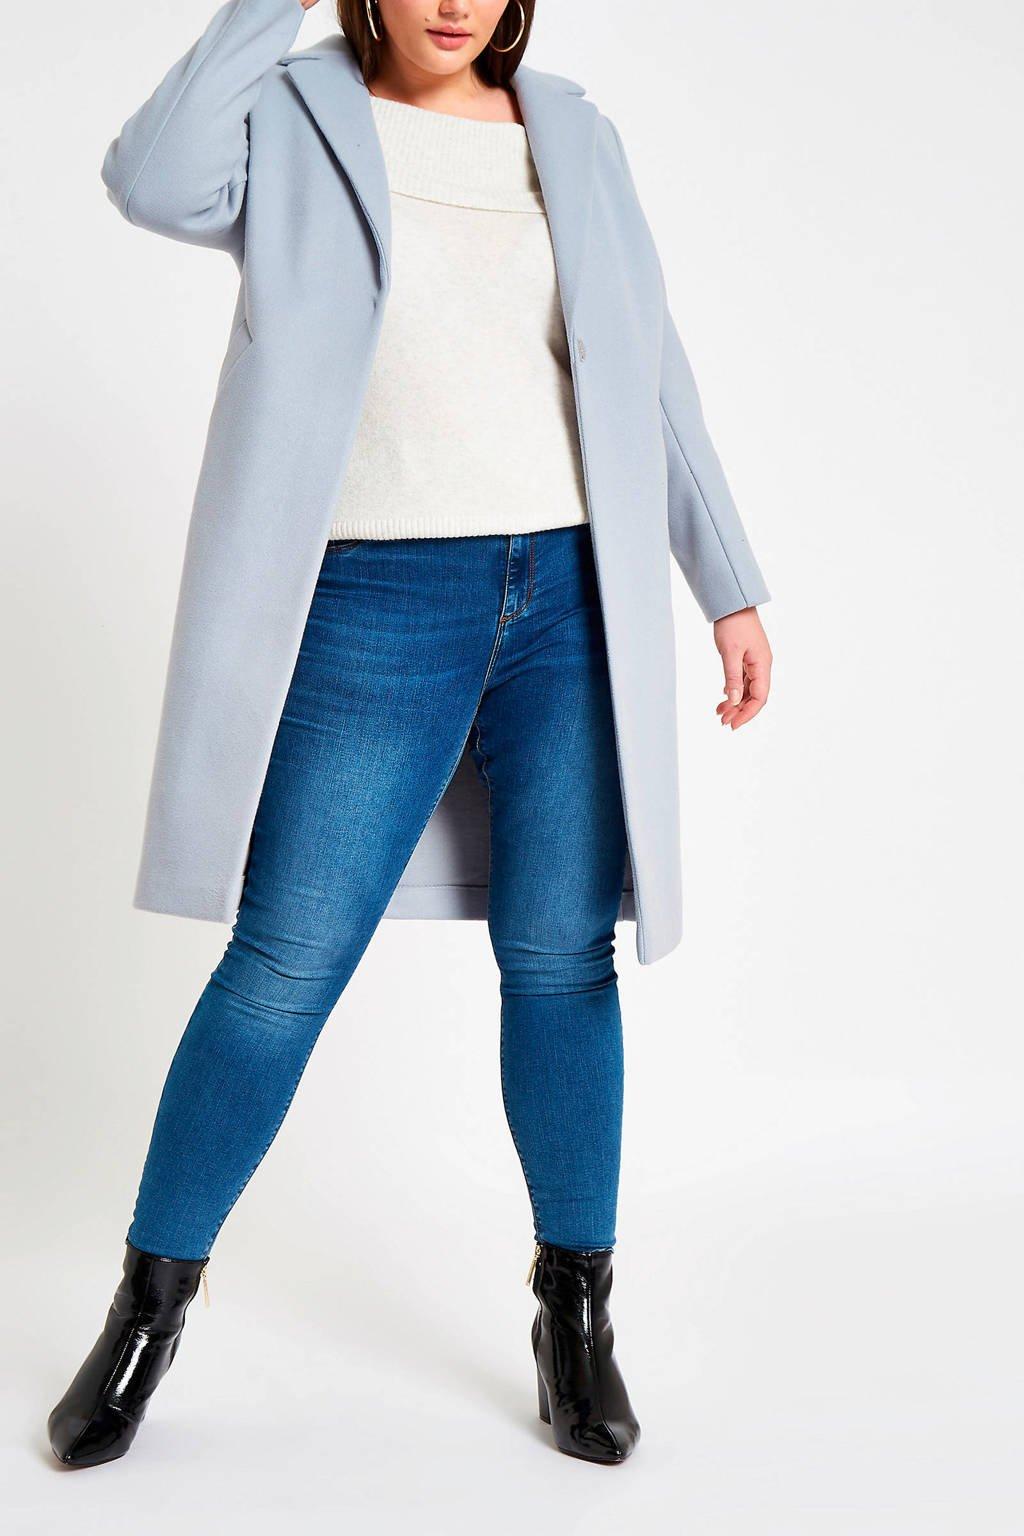 River Island Plus jas met reverskraag, Lichtblauw